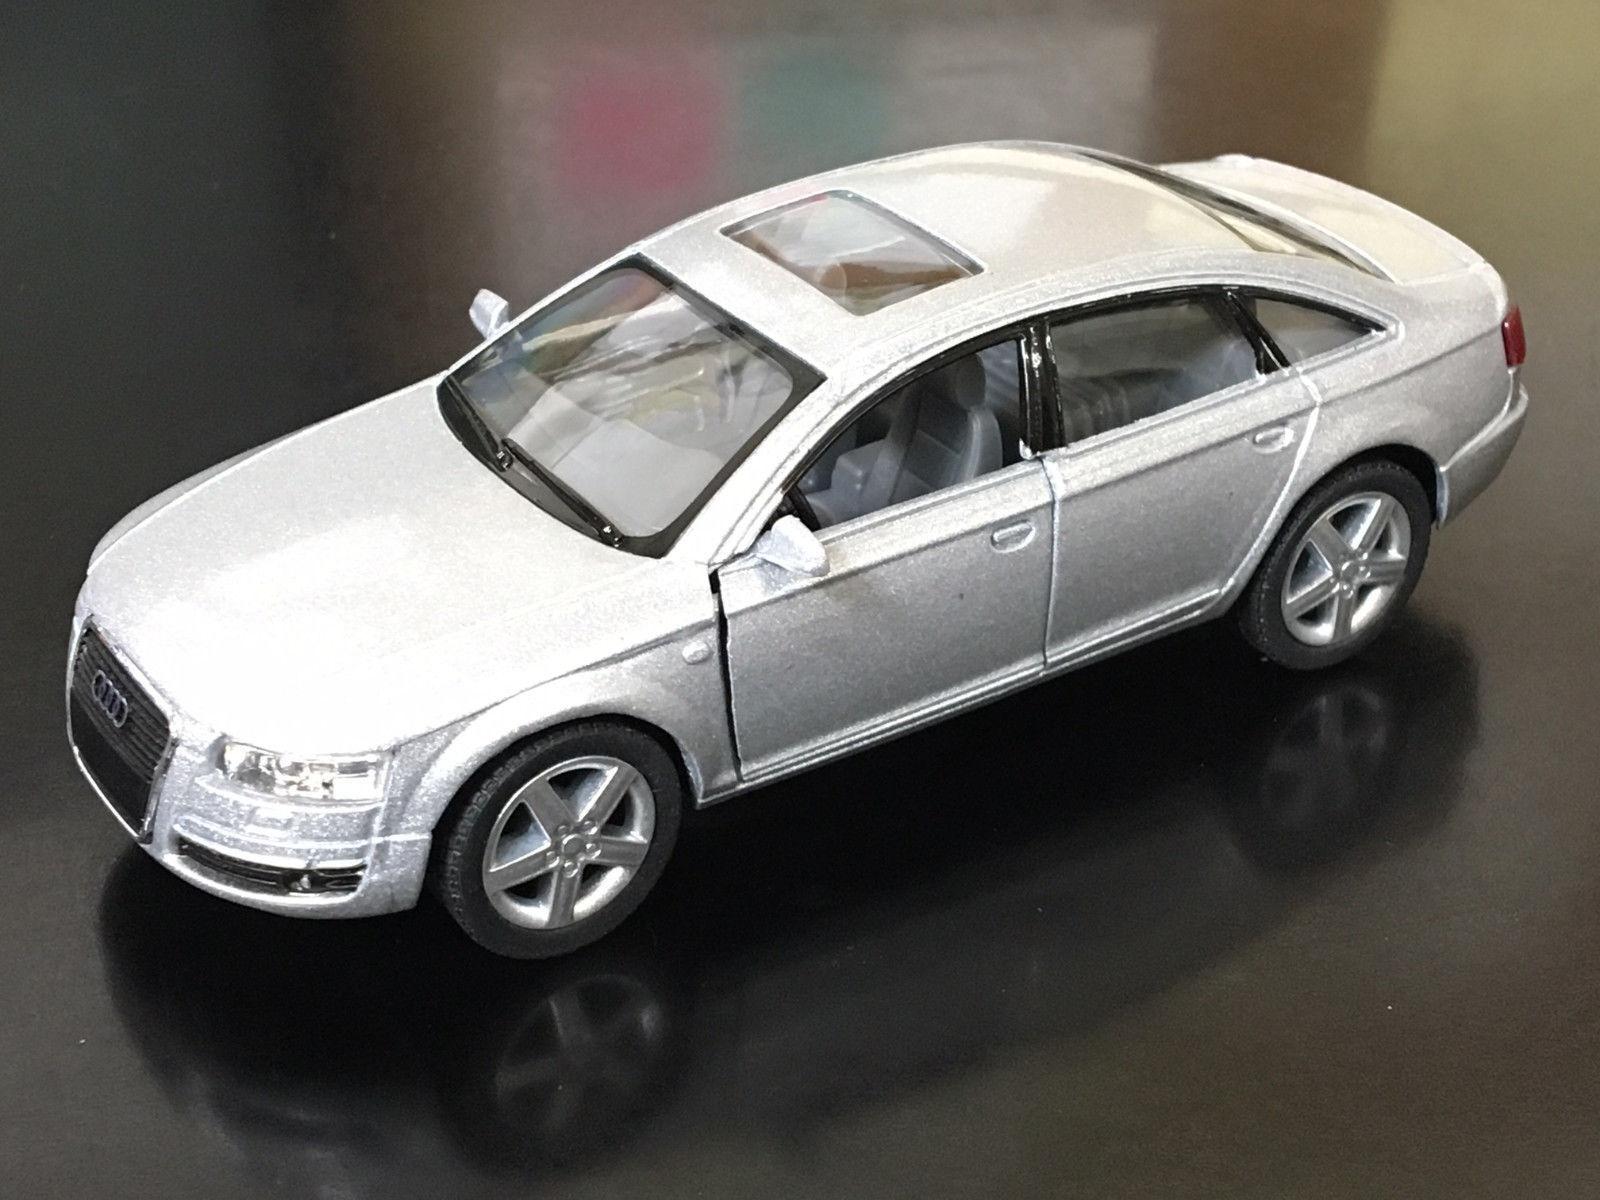 Audi A6 C5 Green 430017102 Diecast Model Car Minichamps 1 43 For Sale Online Ebay